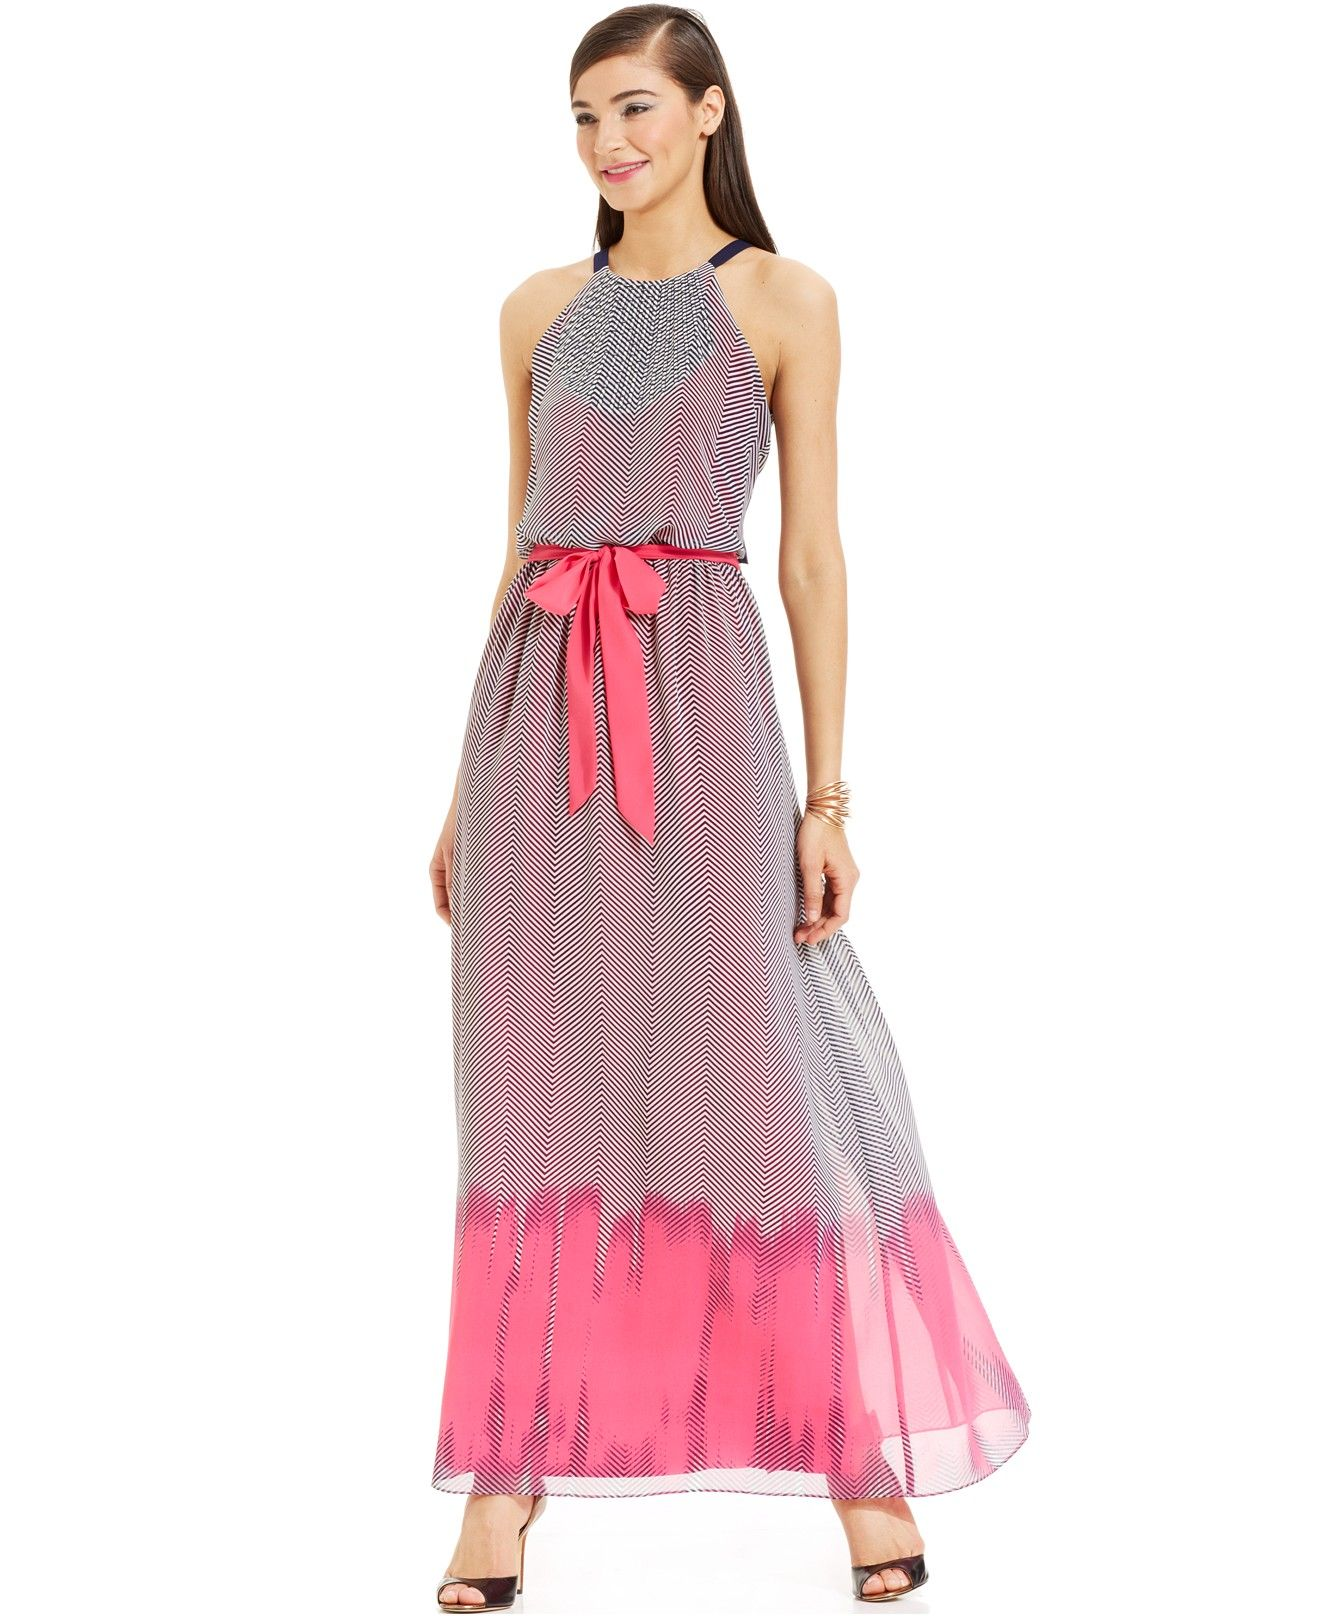 Vince Camuto Chevron Print Blouson Maxi Dress Dresses Women Macy S Fashion Clothes Women Cheap Maxi Dresses Maxi Dress [ 1616 x 1320 Pixel ]